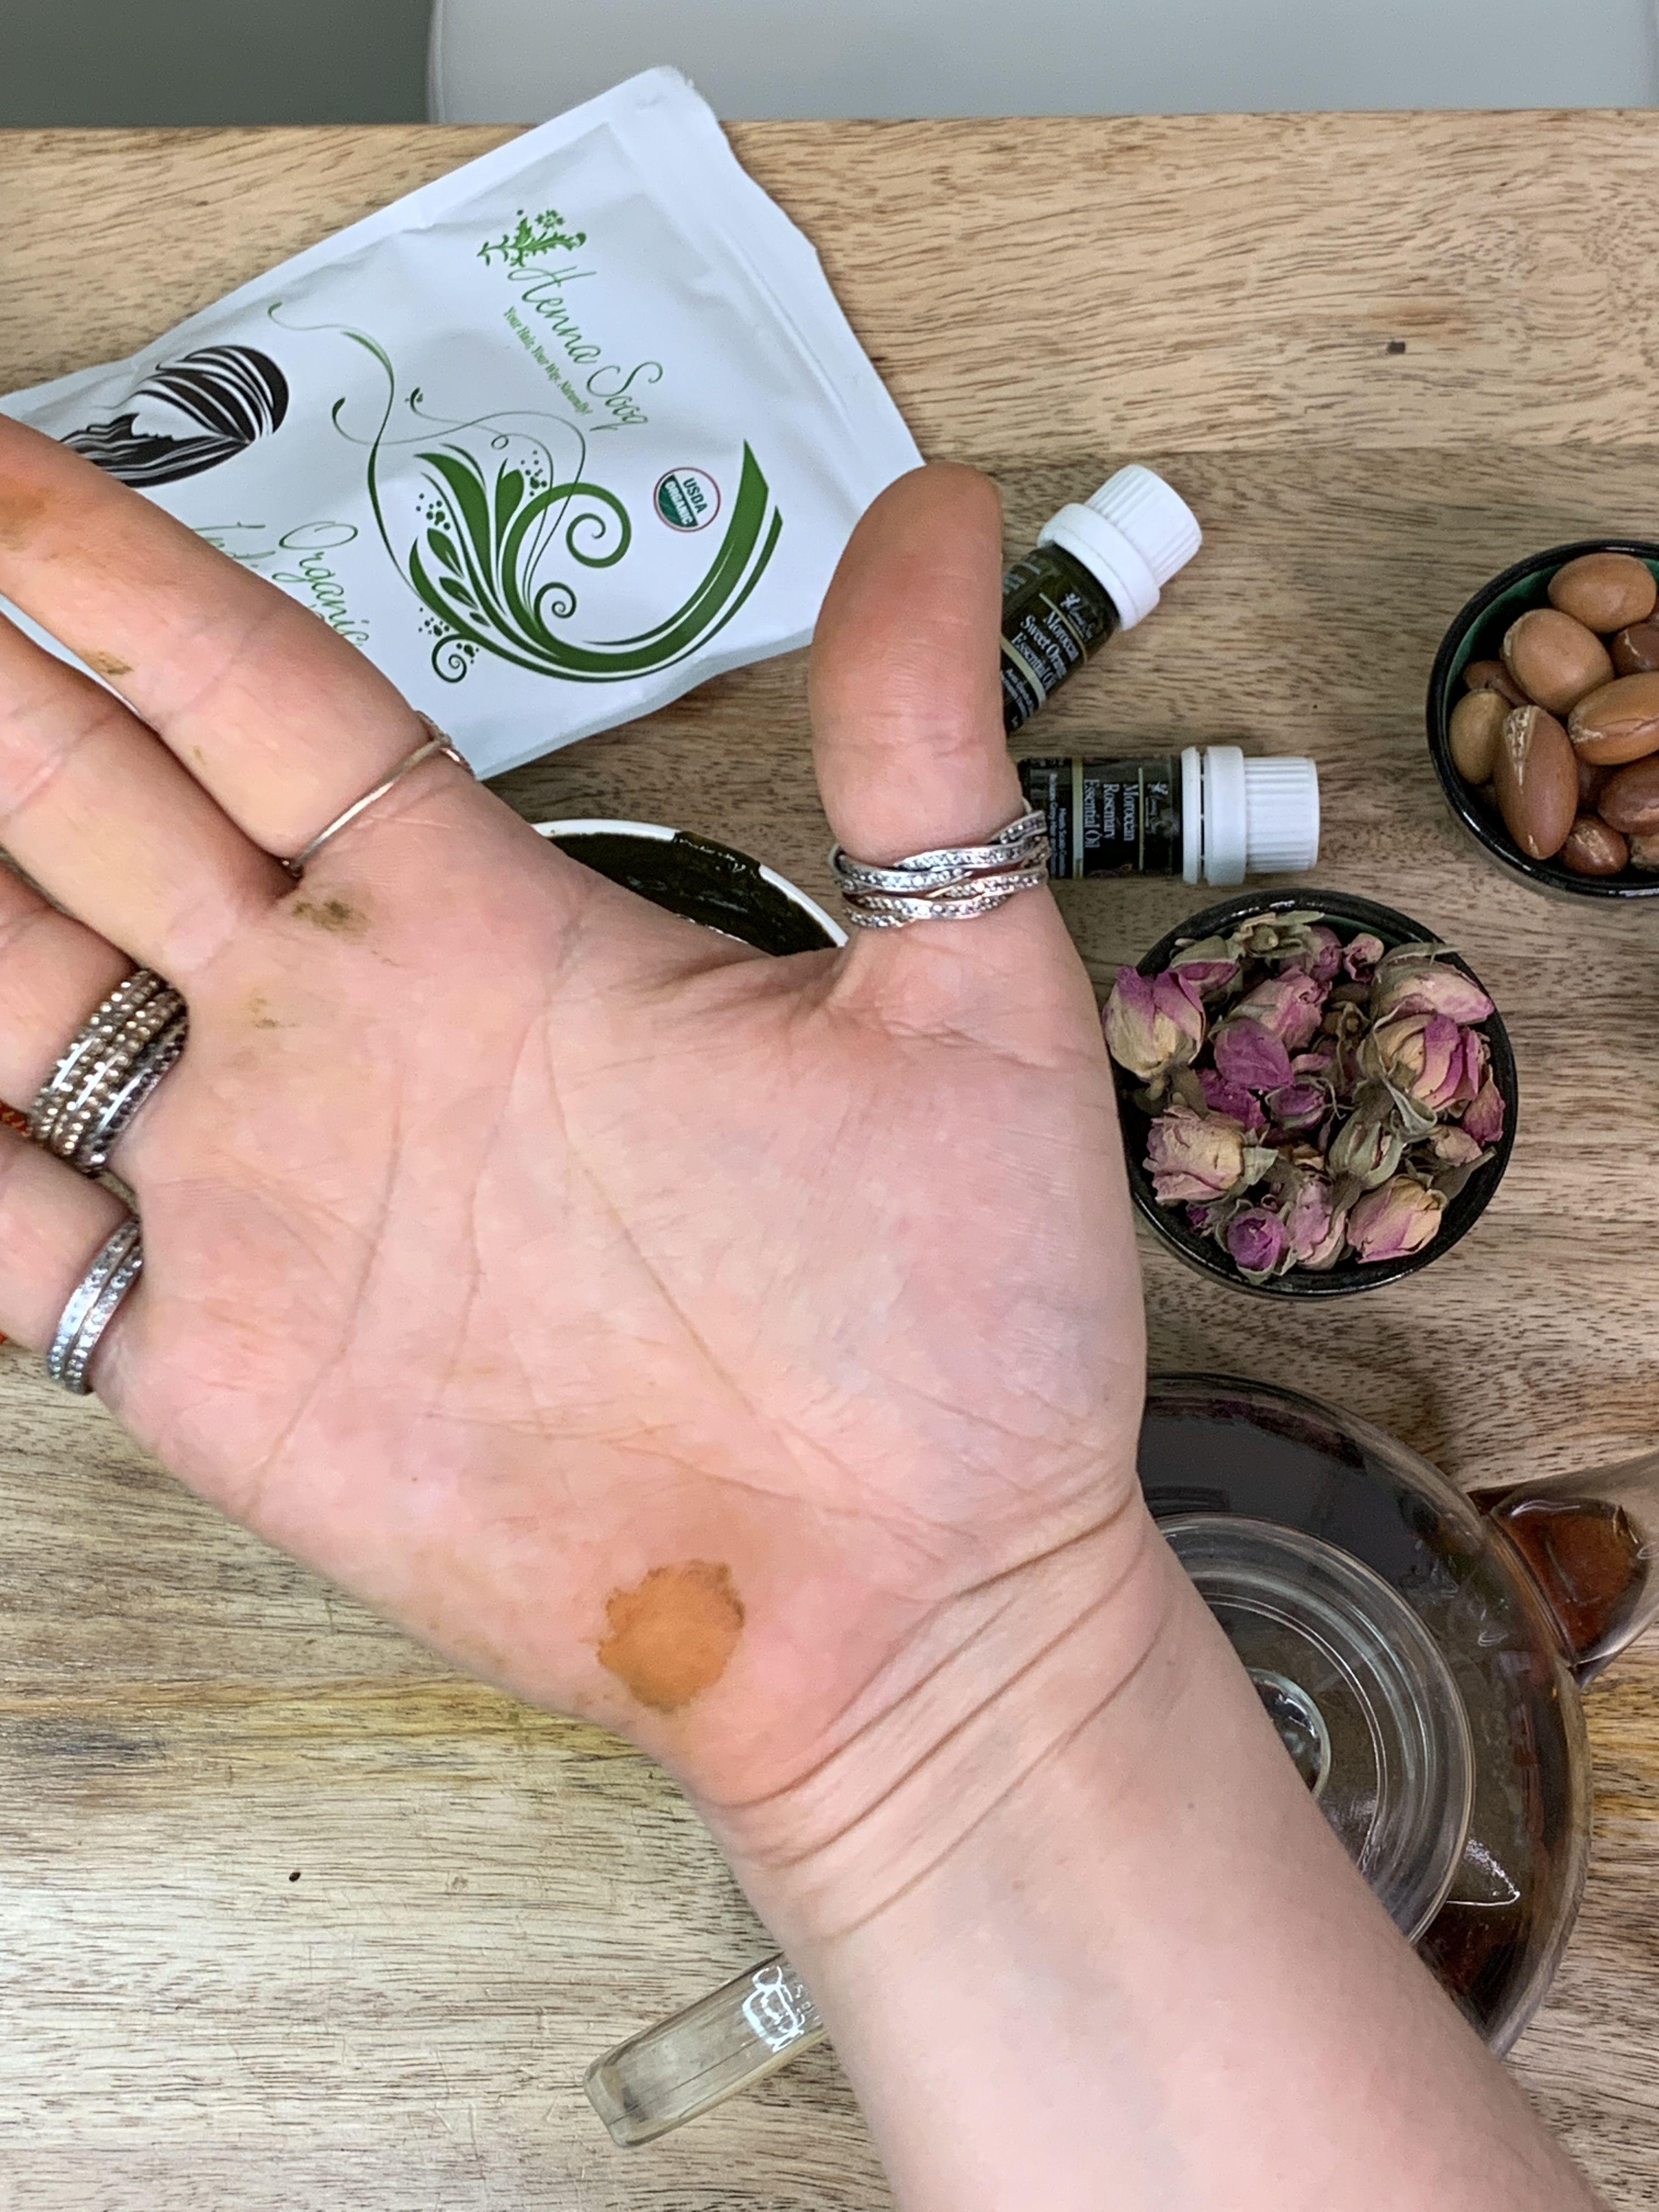 How To Do Henna Body Art In 2020 Henna Tattoo Kit Henna Kit Body Art